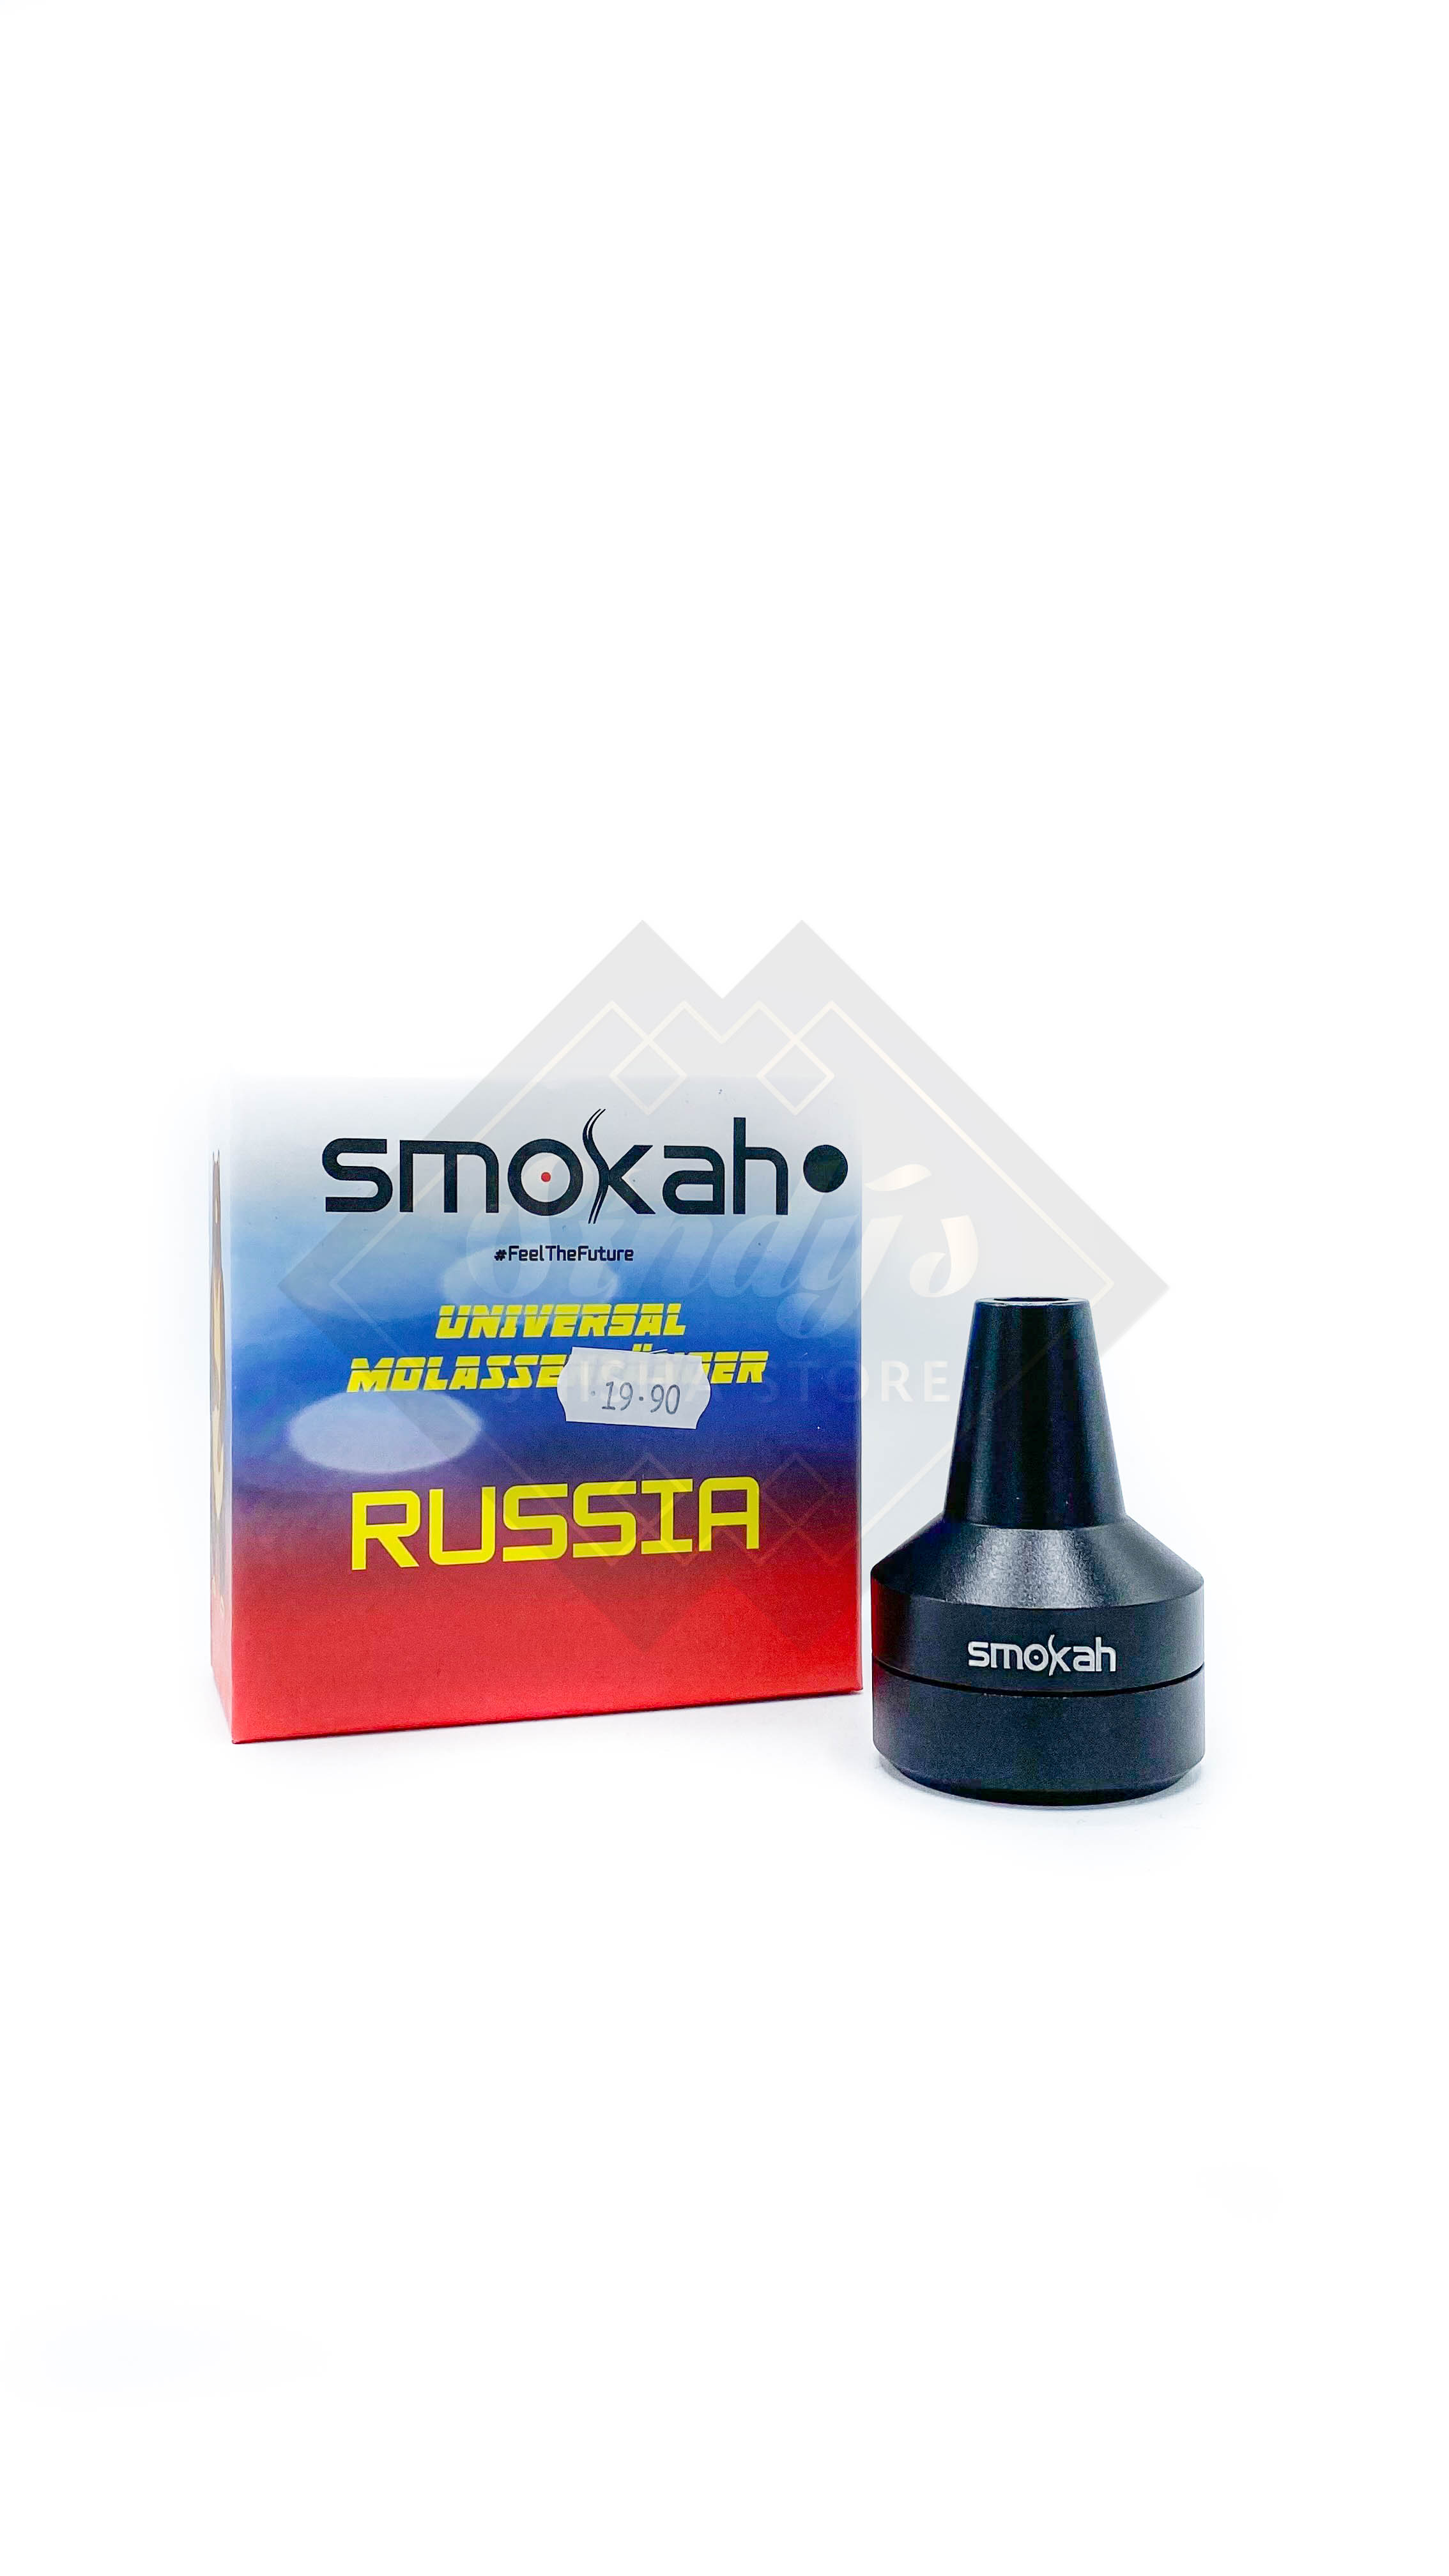 Smokah Molassefänger Russia Schwarz